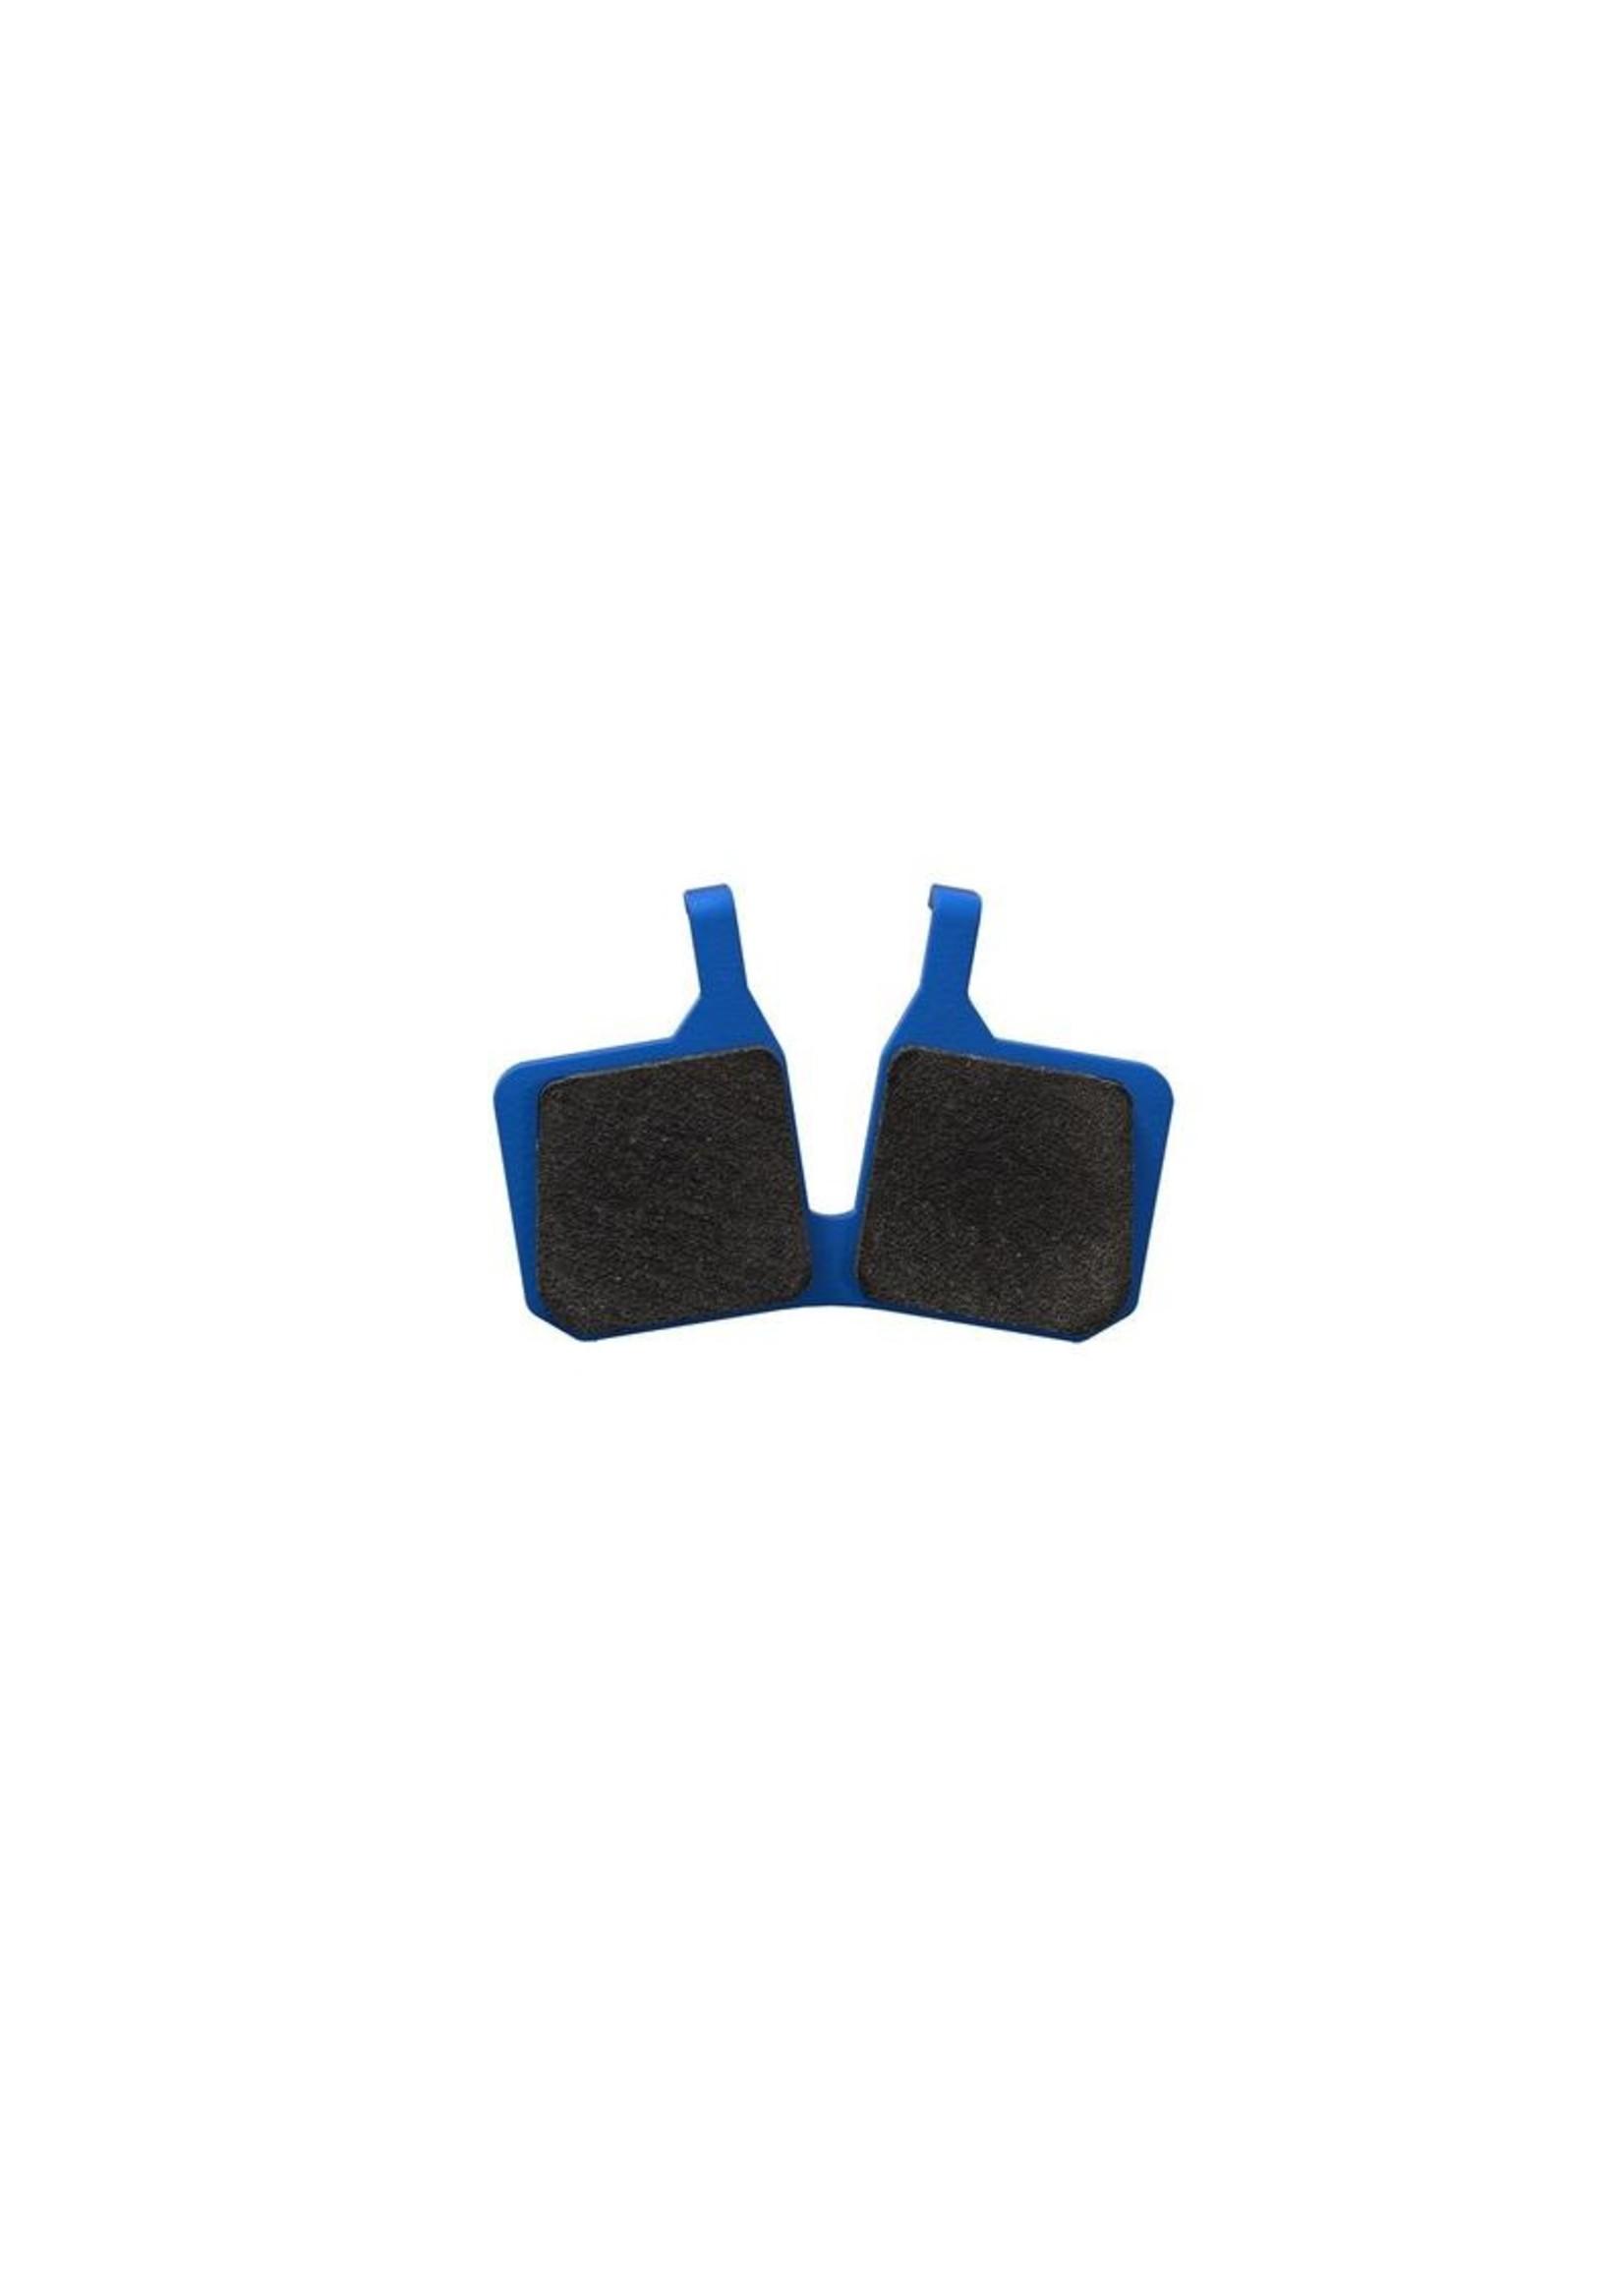 Magura Magura 9.C Comfort Disc Brake Pads, 4 piston (2 pads)